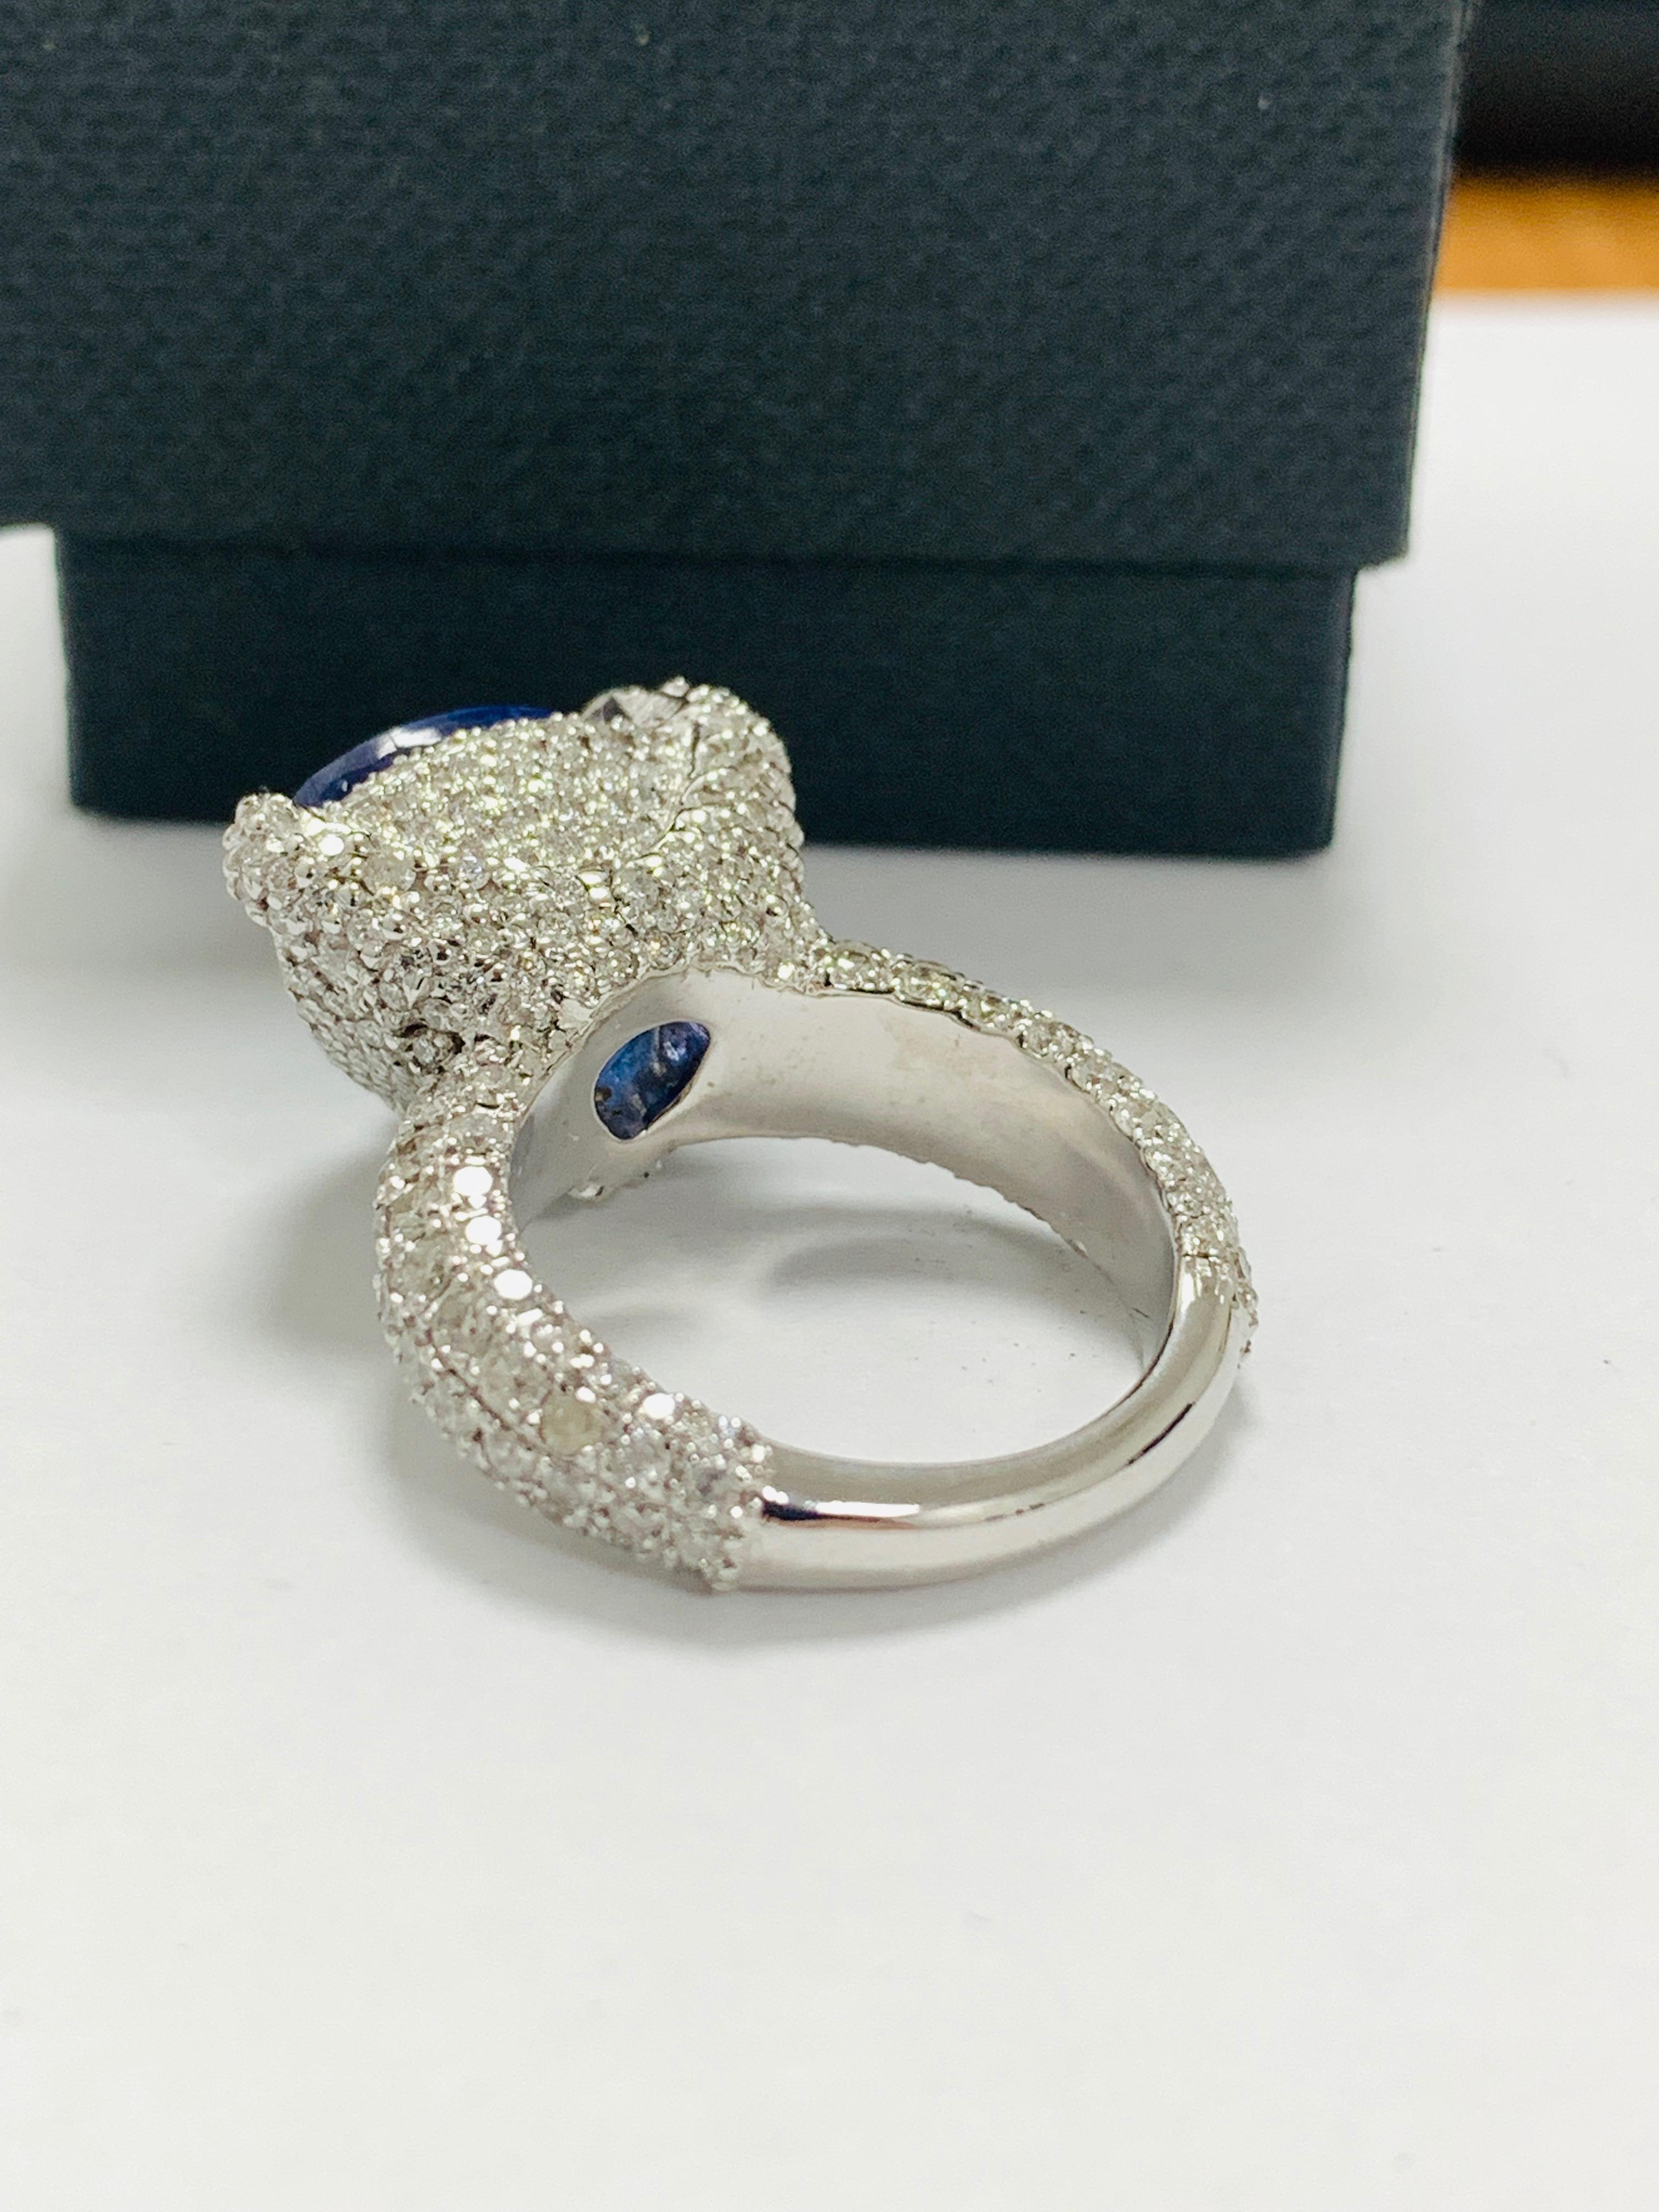 platinum tanzanite ring - Image 6 of 13